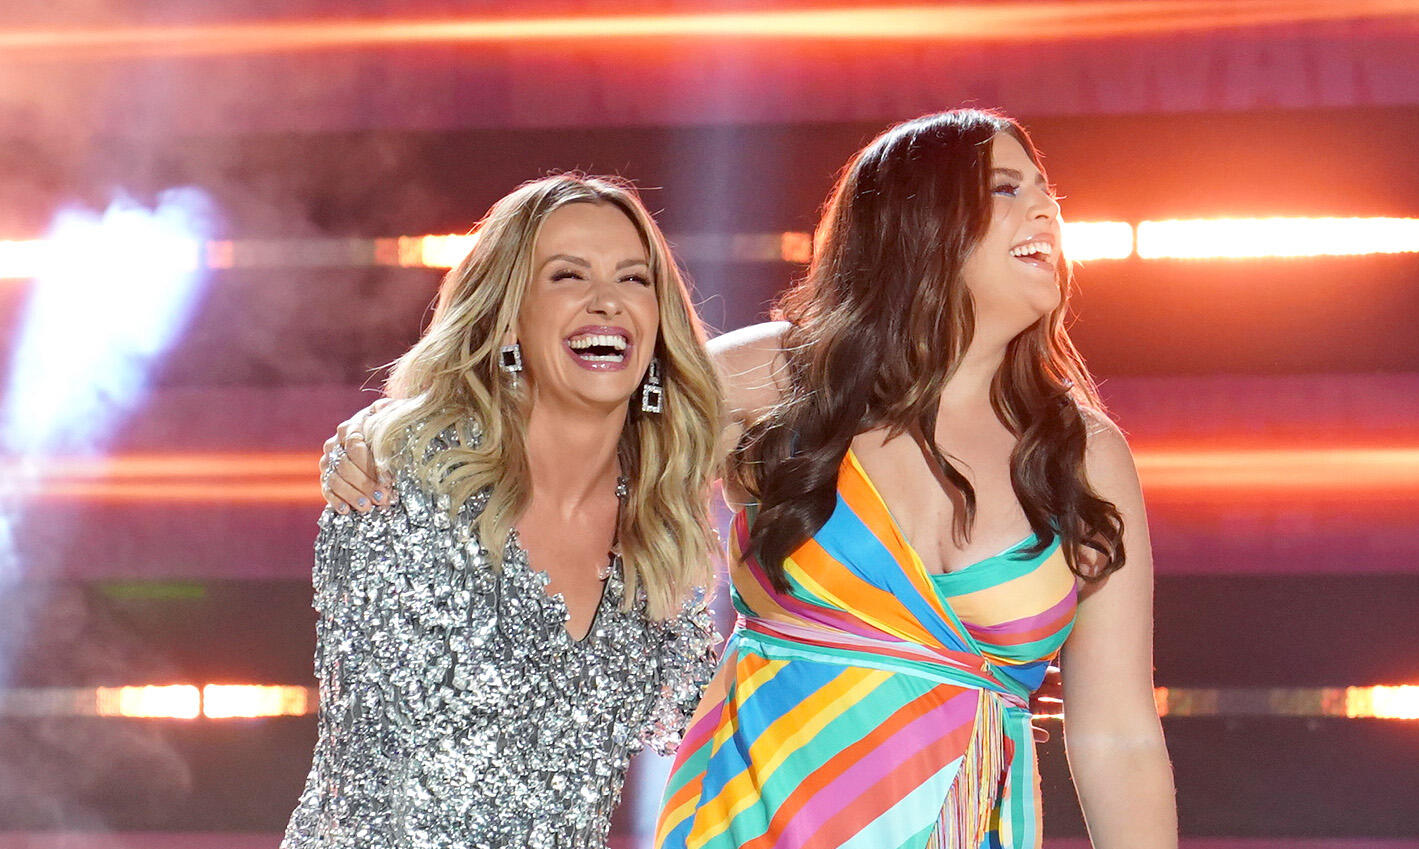 Lady A, Carly Pearce Kick Off CMT Awards With Latest Single 'Like A Lady'